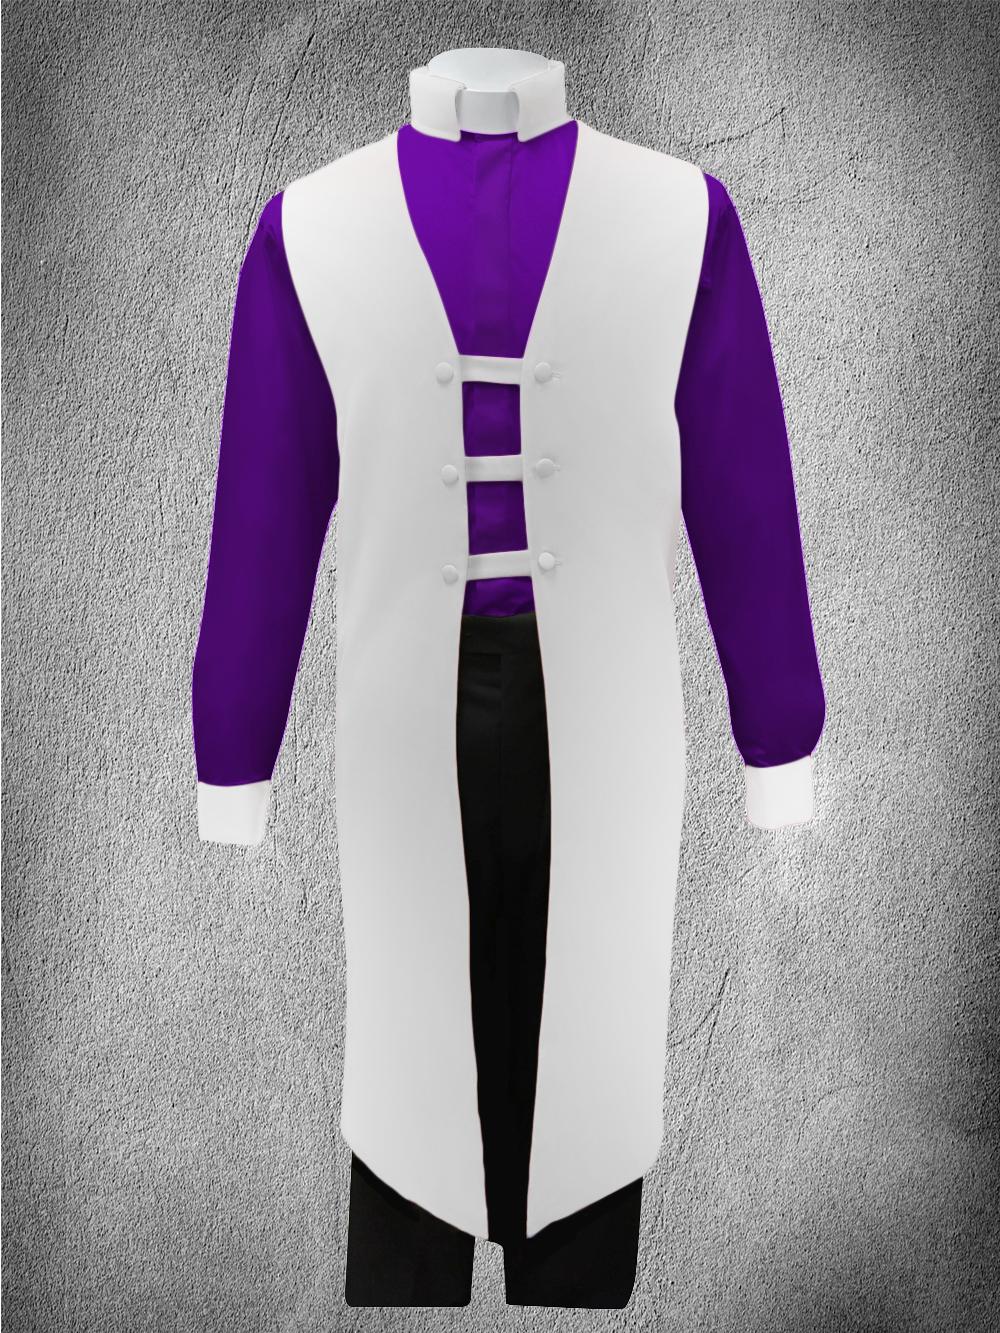 Contrast Ministerial Vesture Set White/Purple-White